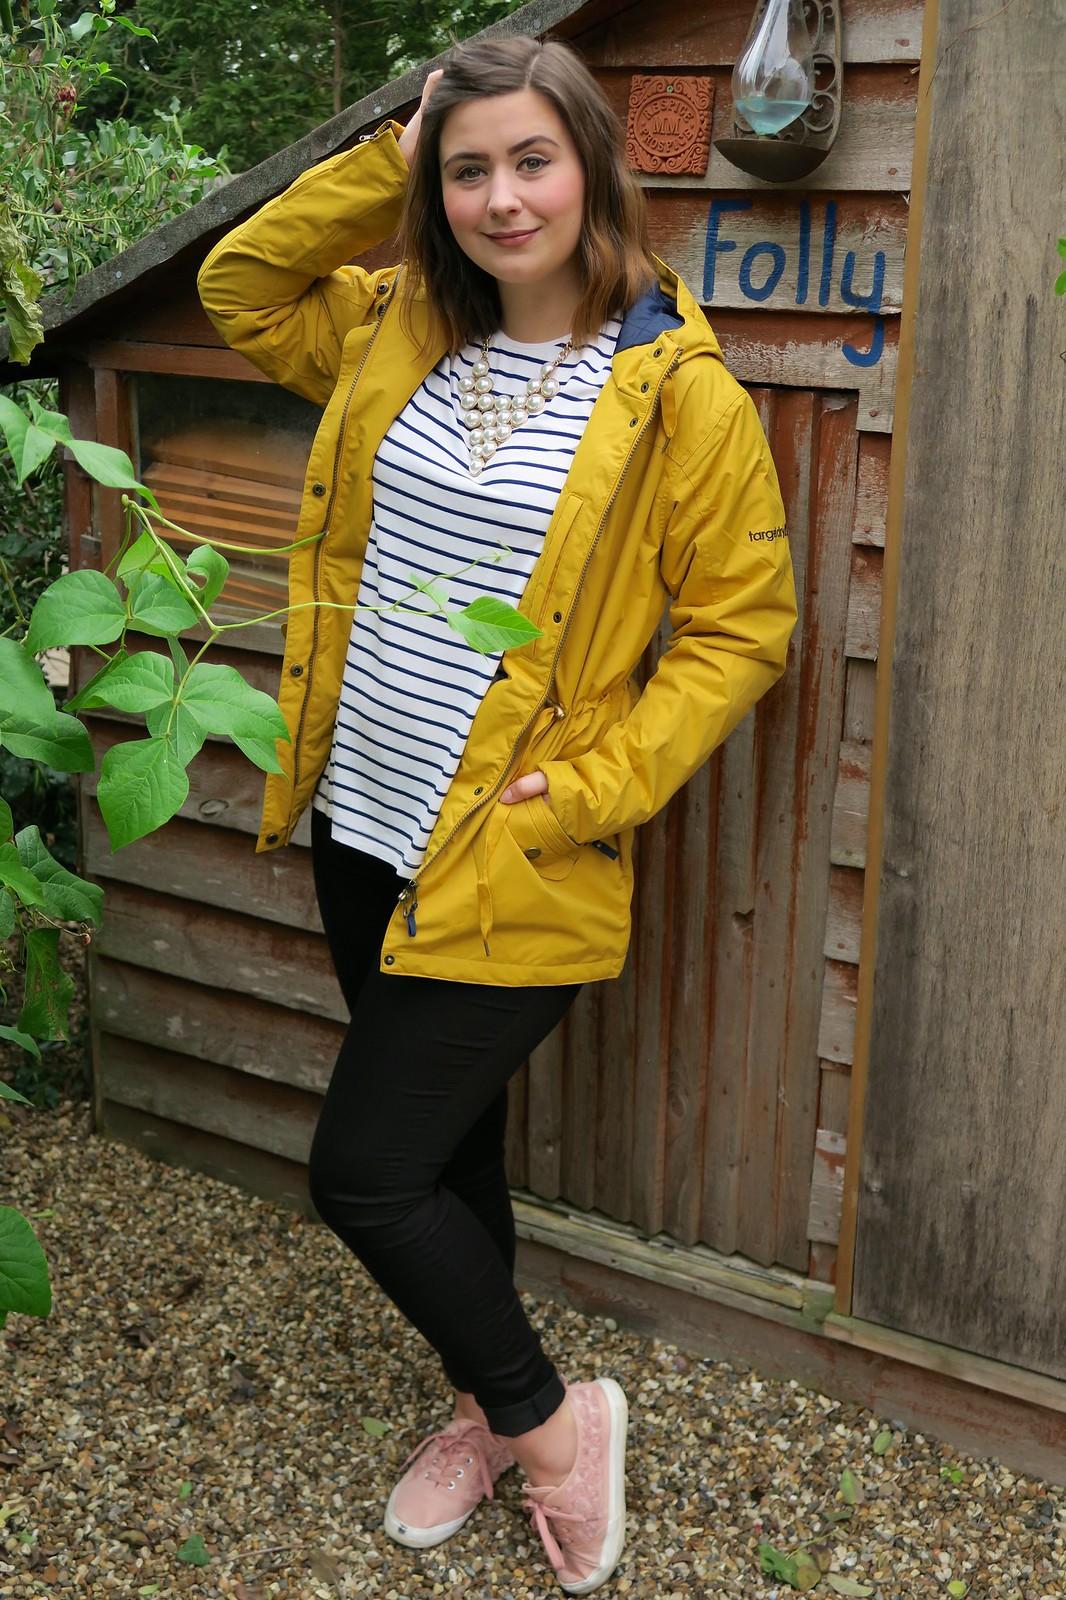 uk fashion blogger scotland edinburgh target dry waterproof coat